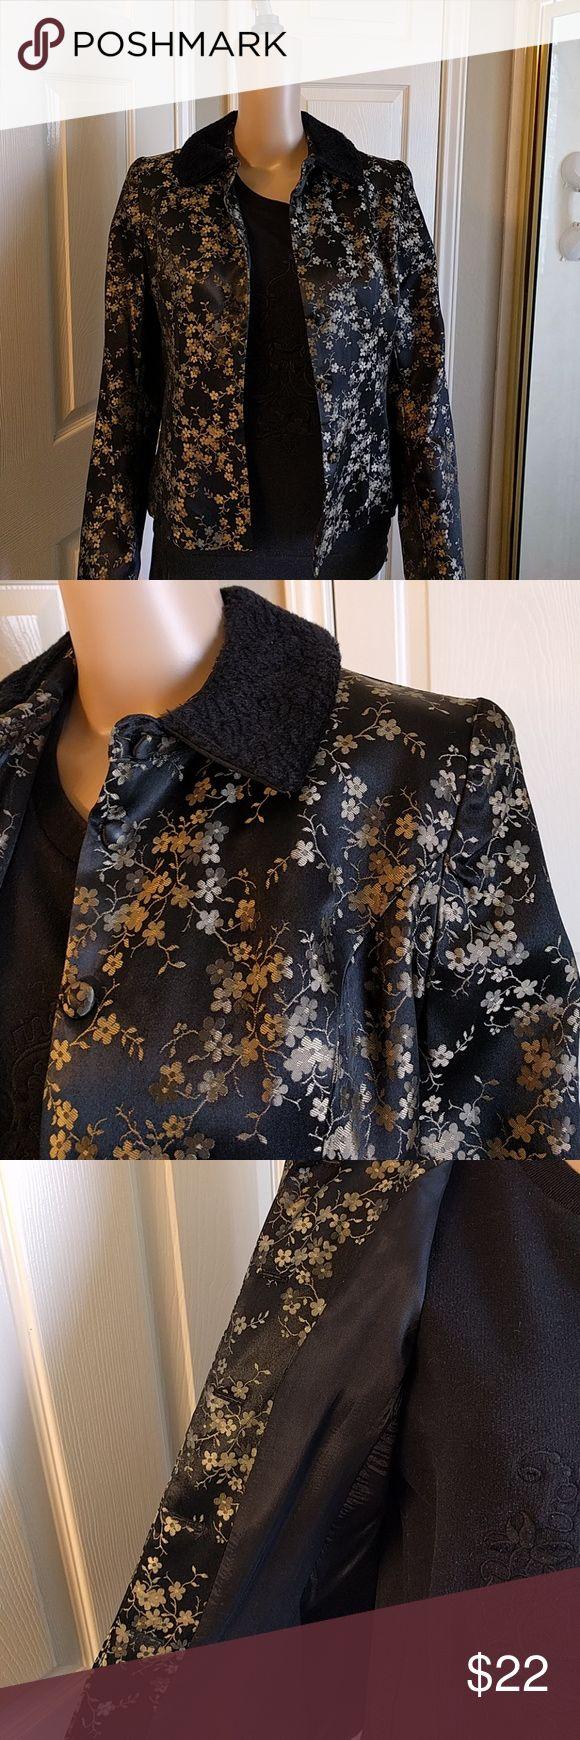 Scott McClintock Dressy Jacket Stylish Black with Gold Flower Dress Jacket.  Fully Lined with Faux Collar. Scott McClintock Jackets & Coats Blazers